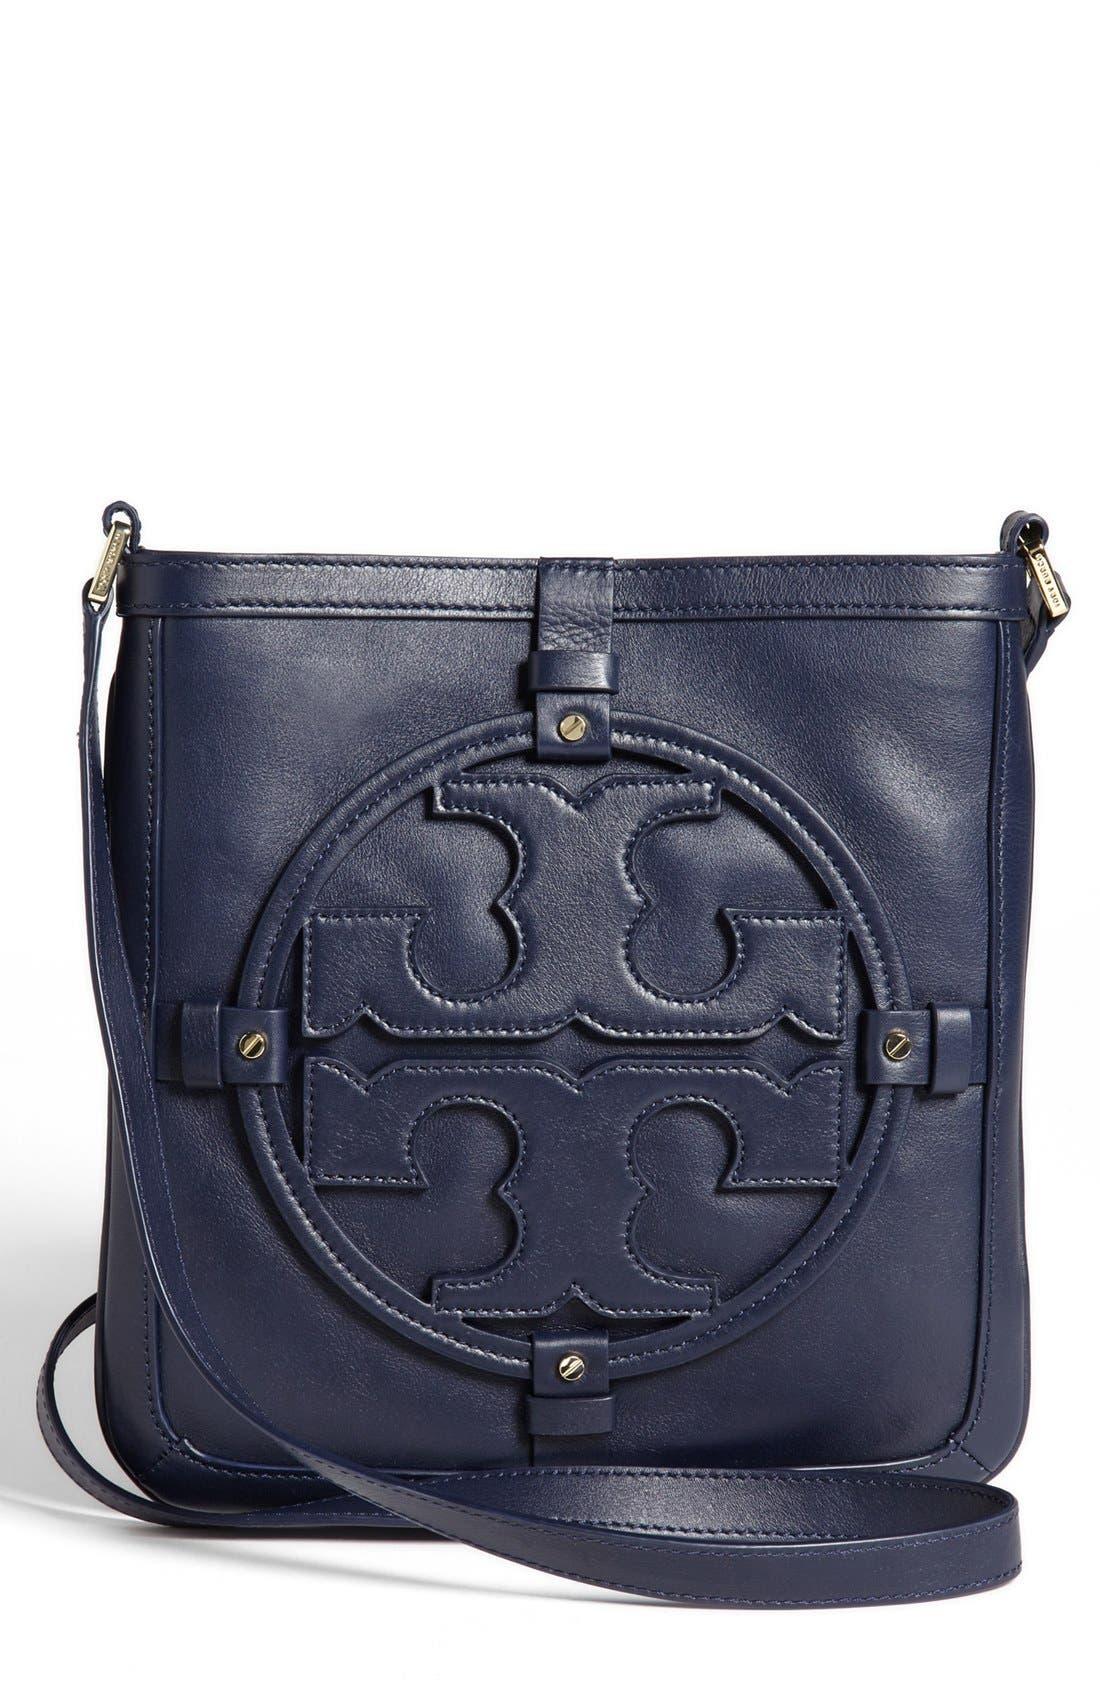 Alternate Image 1 Selected - Tory Burch 'Holly' Crossbody Bag